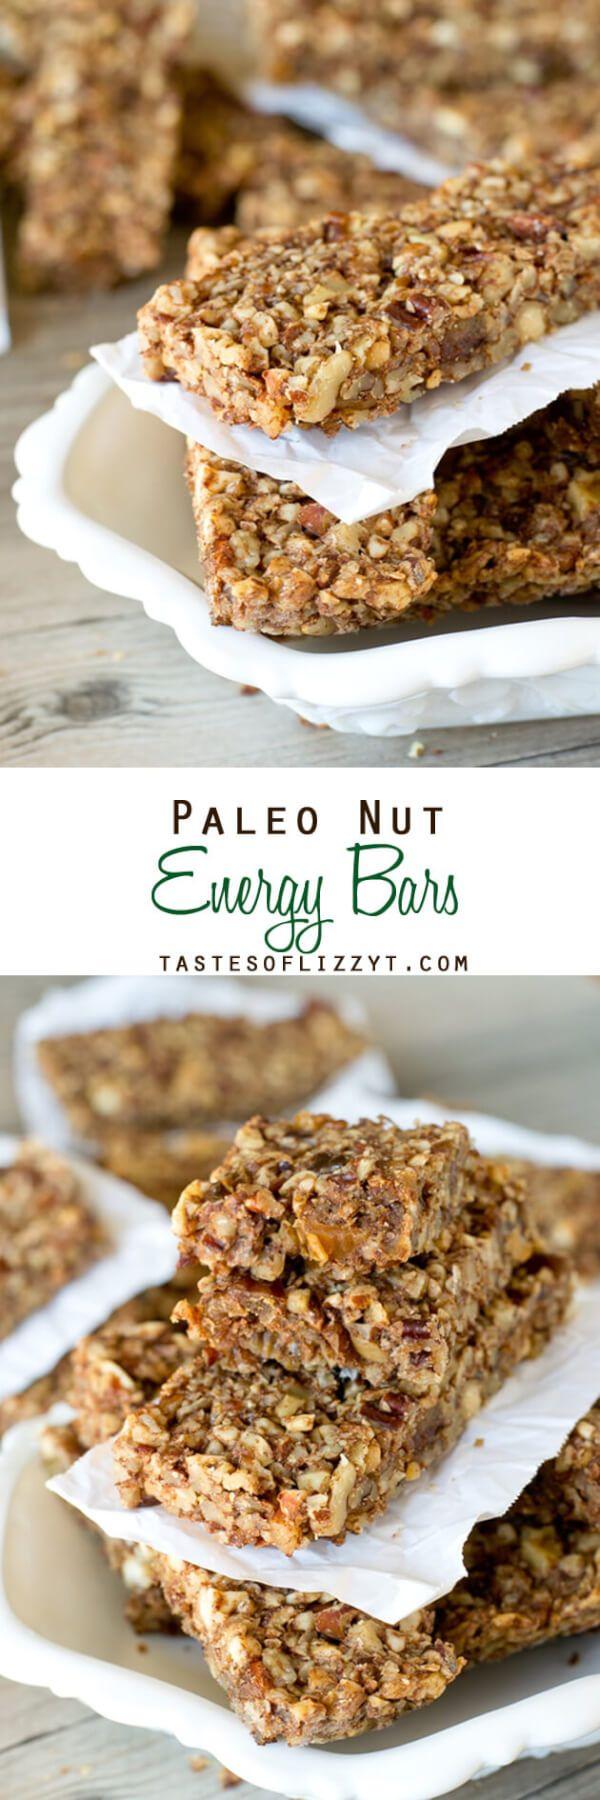 Paleo Nut Energy Bars Recipe